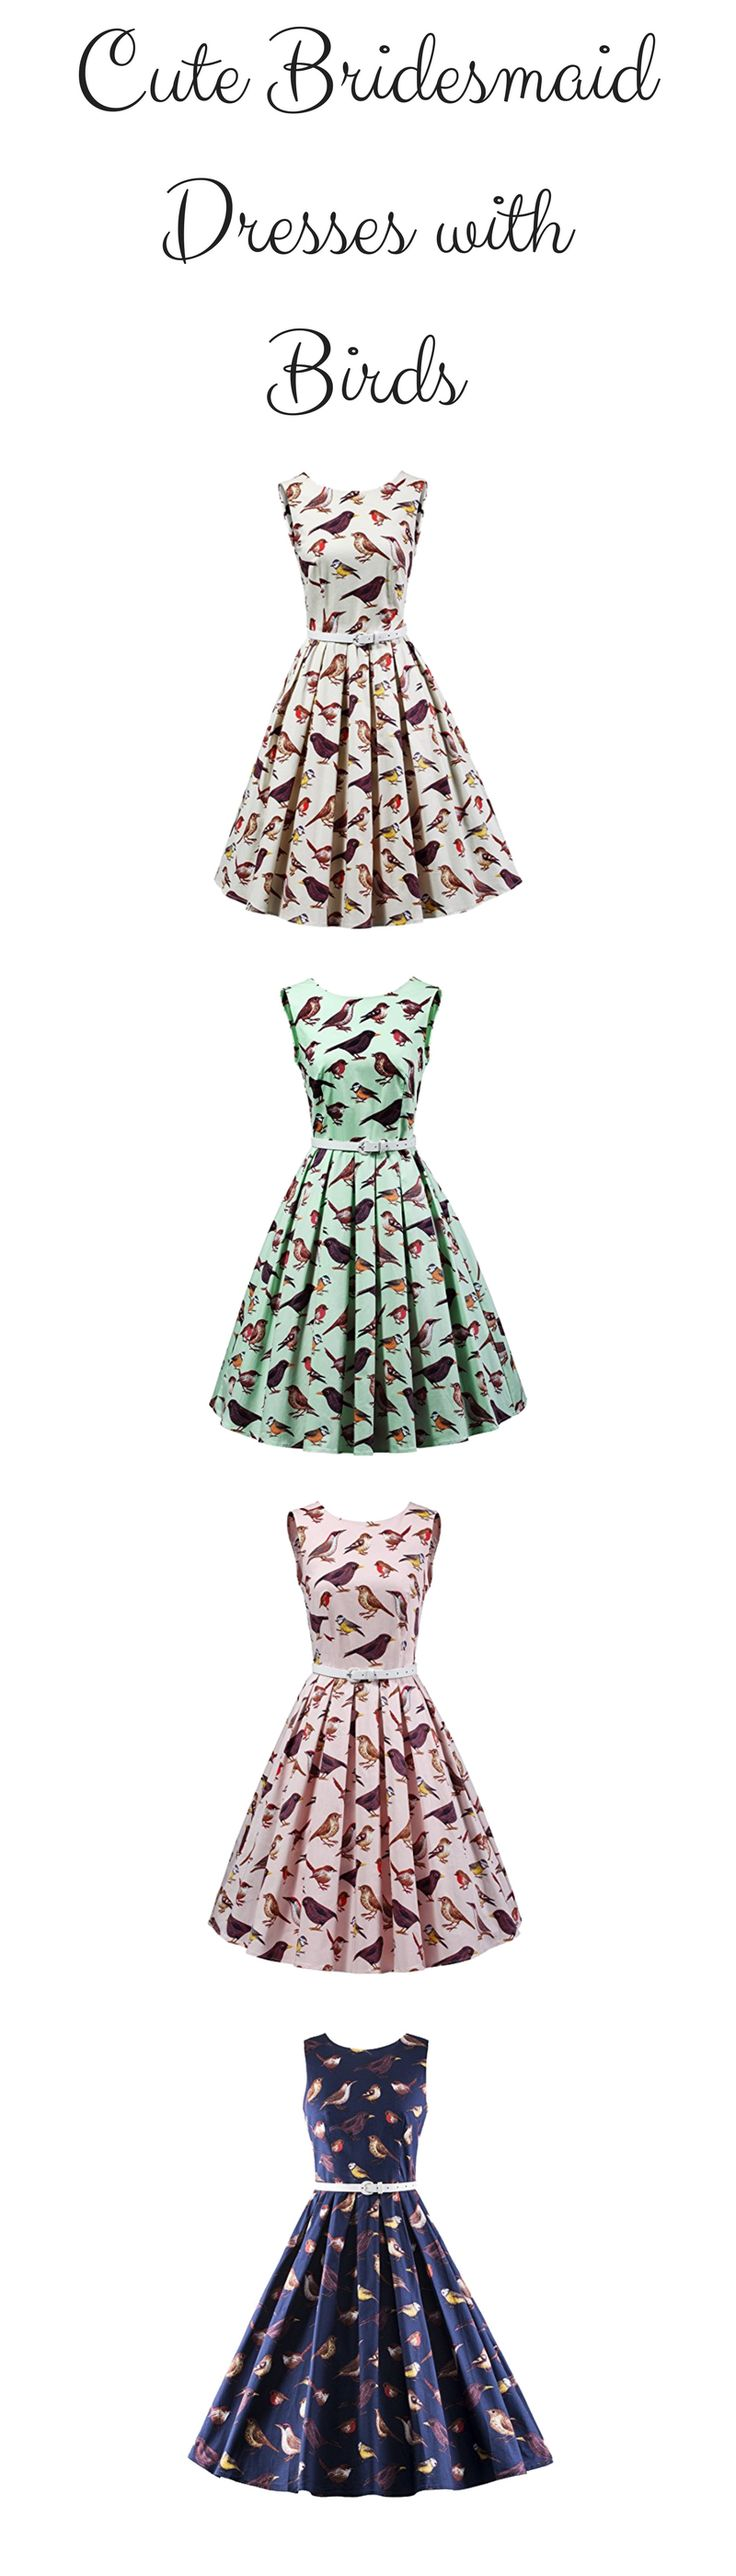 Cute bridesmaid dresses with birds in a 50s retro vintage style tea dress - Women's Vintage 1950s Sleeveless Dress with Boat Neck Inspired Rockabilly Swing Dress - https://www.amazon.com/dp/B06XDMVK8B/ref=as_li_ss_tl?th=1&linkCode=ll1&tag=theweddingclu-20&linkId=3c3594e7846f54c8ca9074cfa2b59f8d